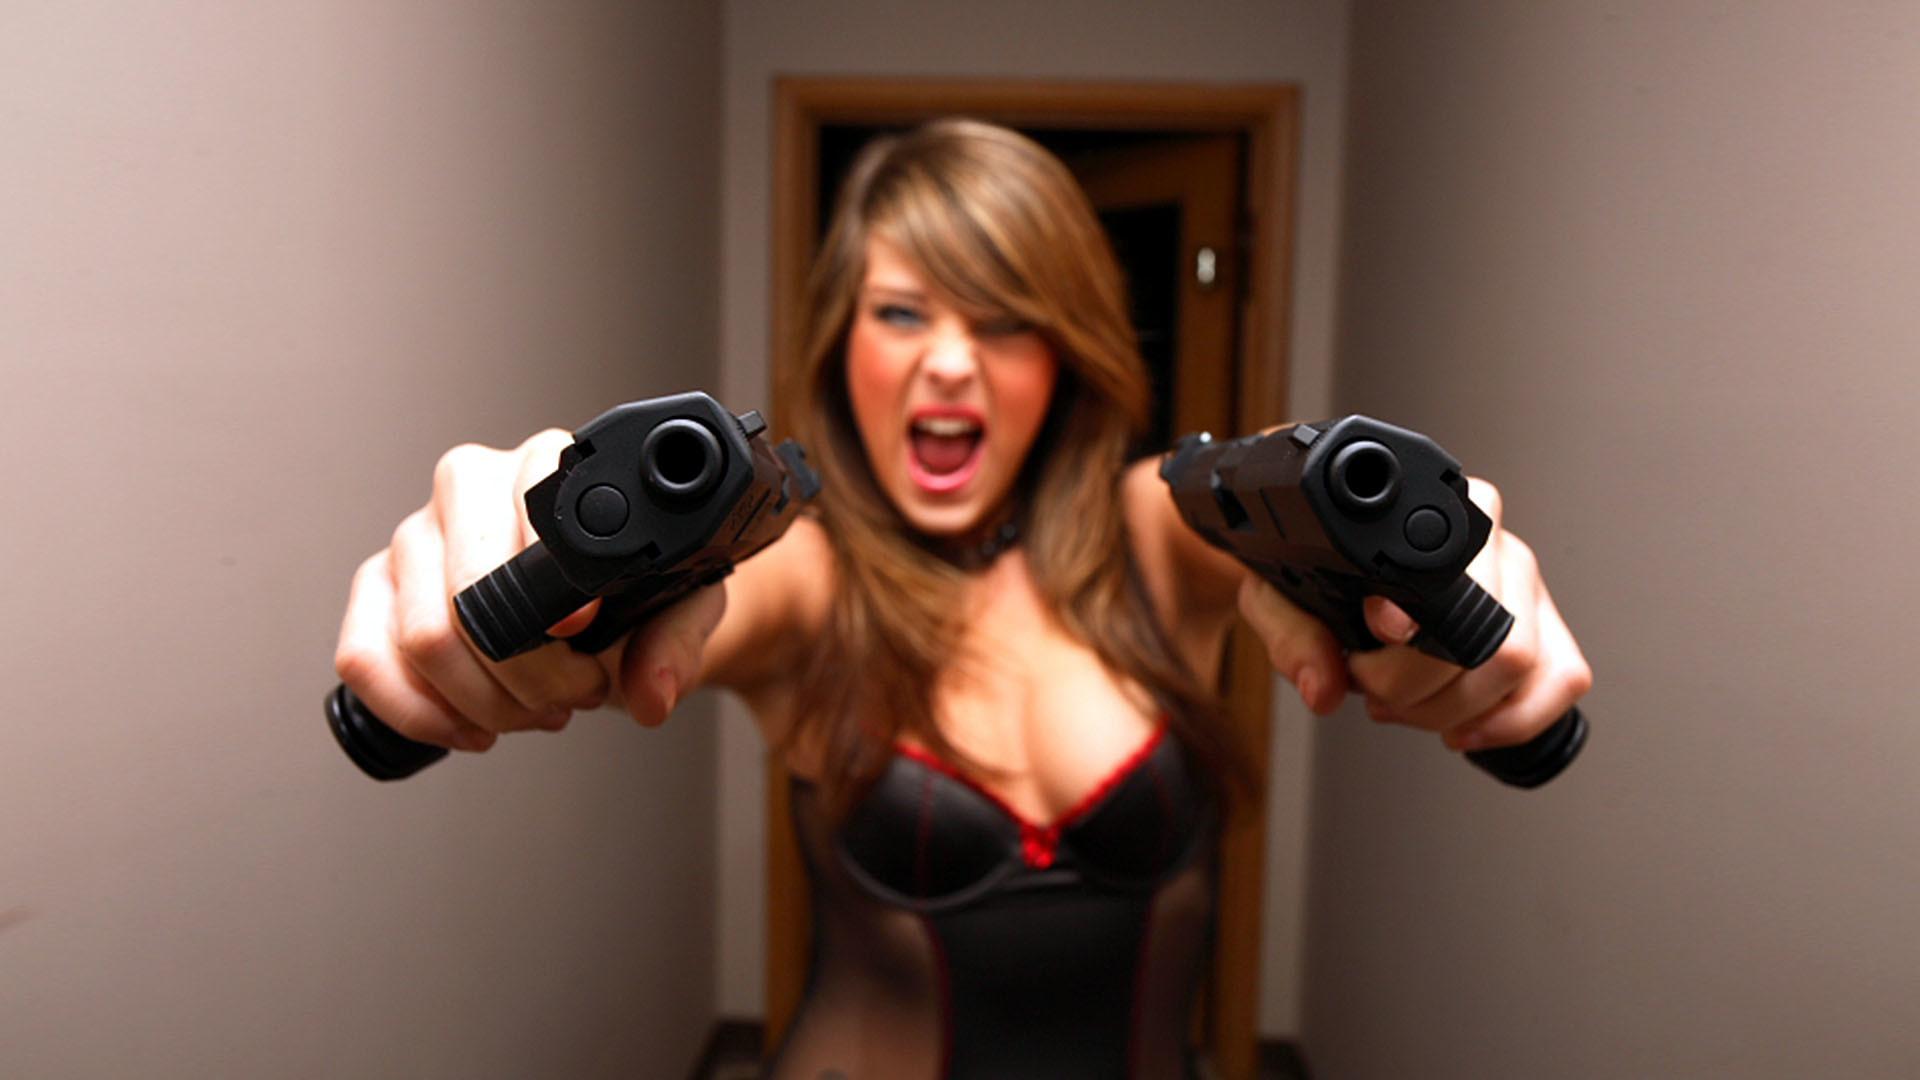 Girl With Gun Desktop Wallpapers THIS Wallpaper Girl Gun Wallpapers  Wallpapers)